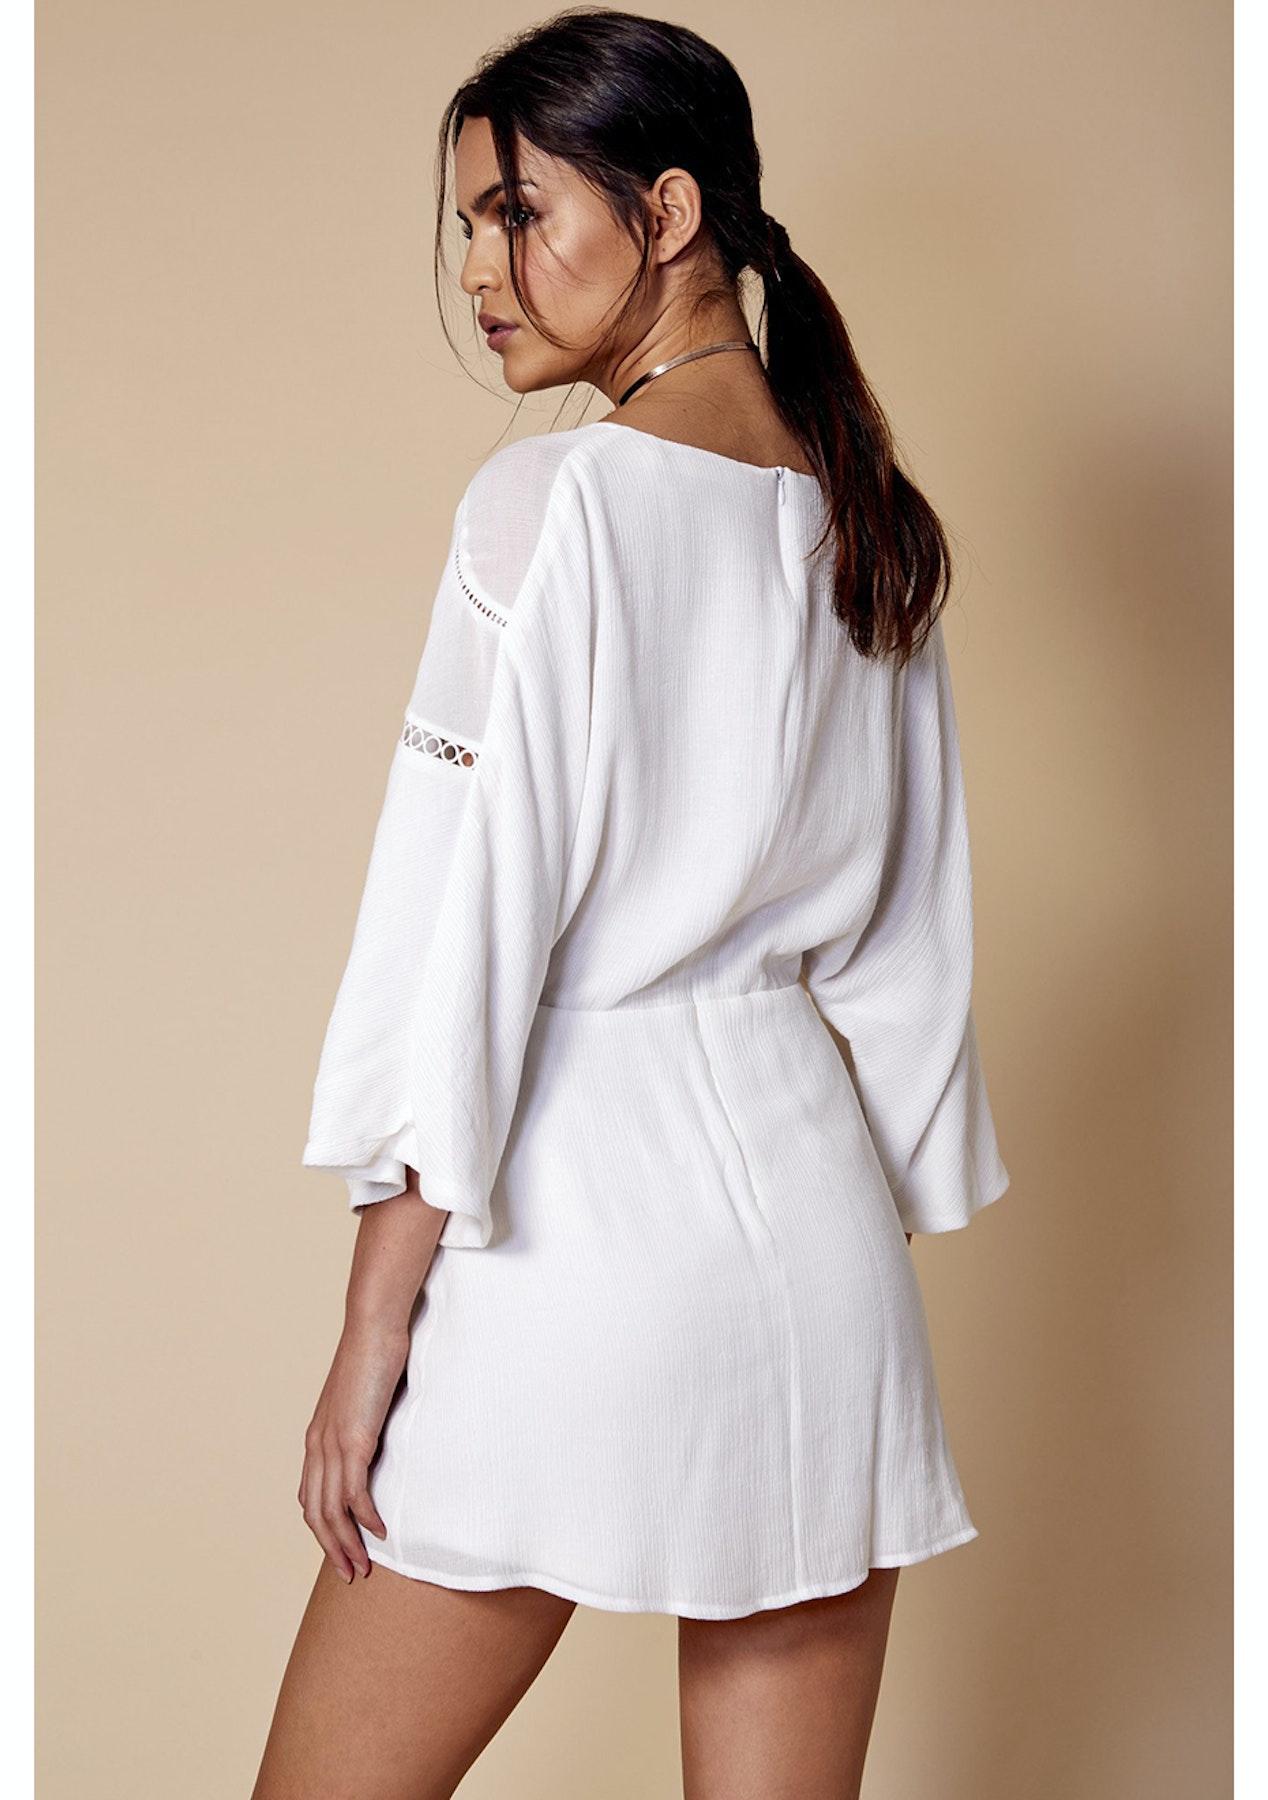 9ae35f555dd1 Winona Australia - Zara Playsuit - White - Winona Australia - Onceit